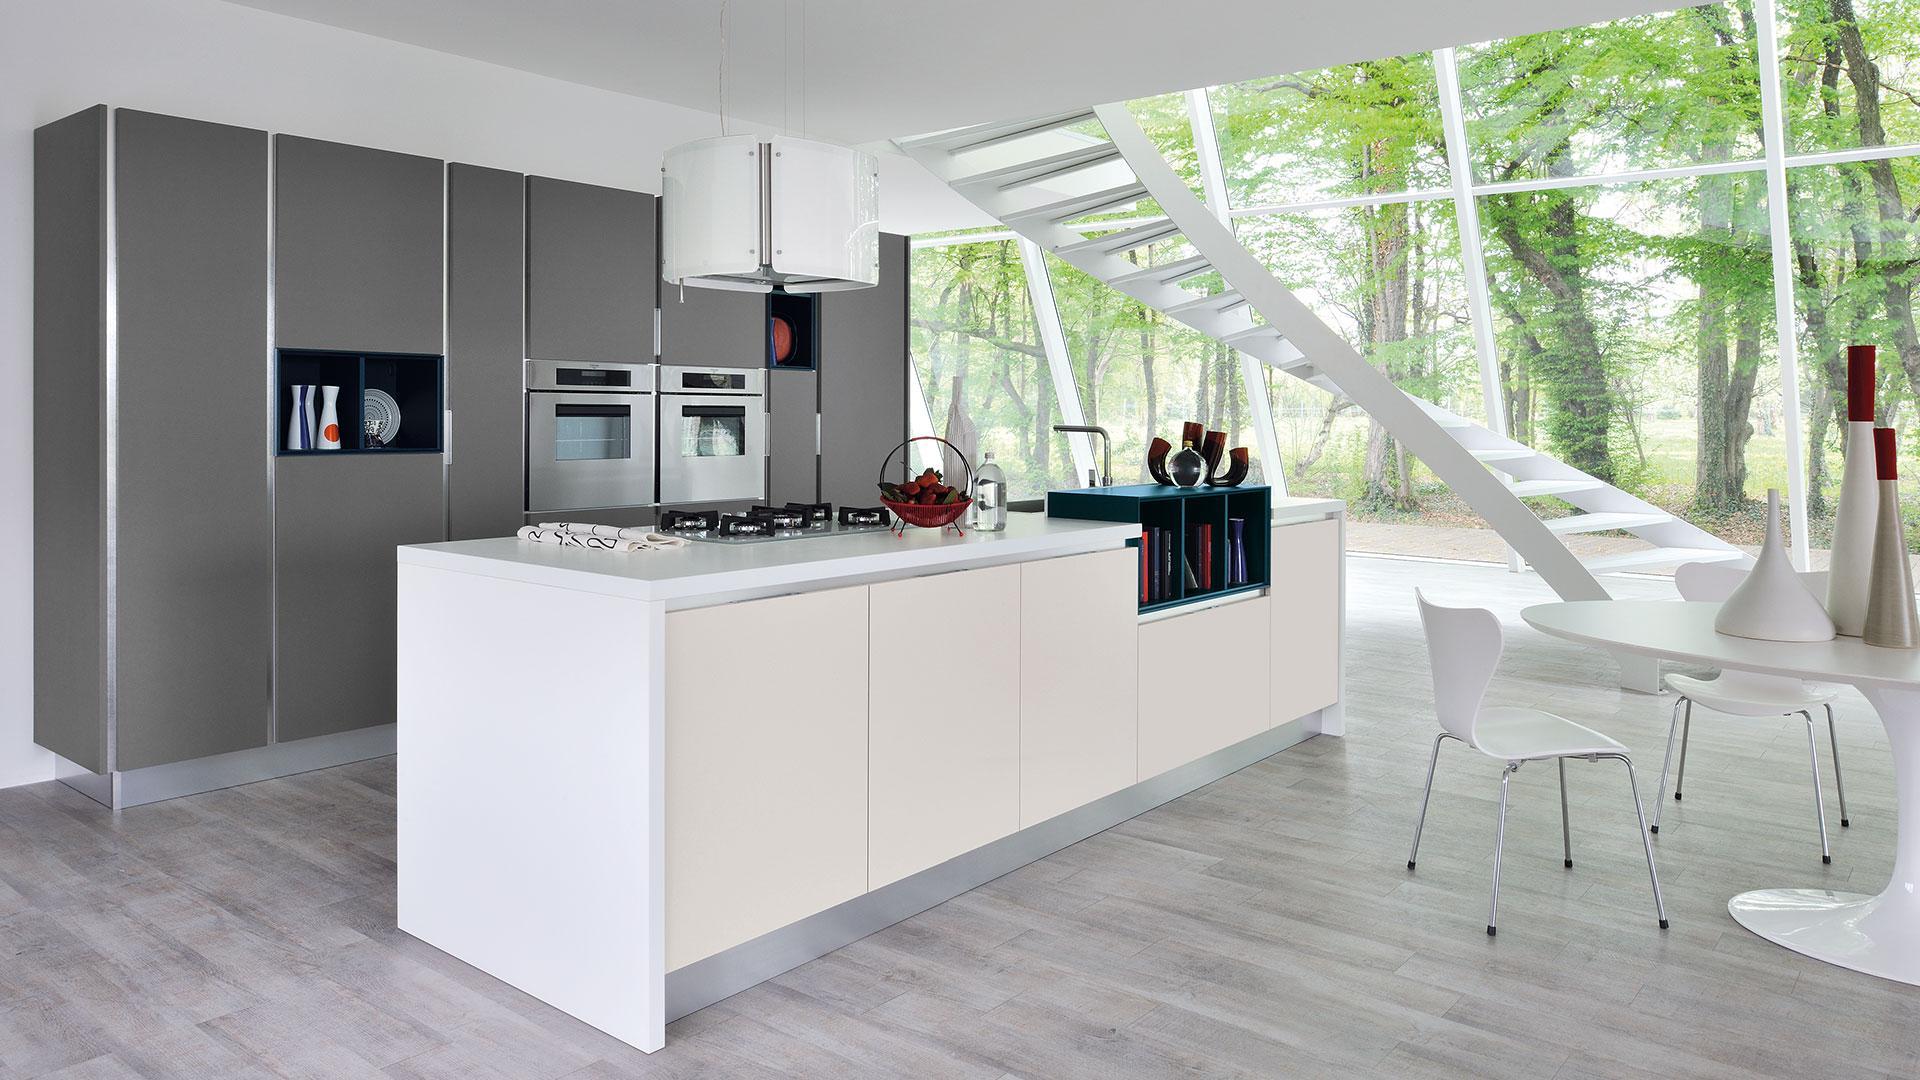 Cucina Agnese Lube Opinioni cucine | centro cucina